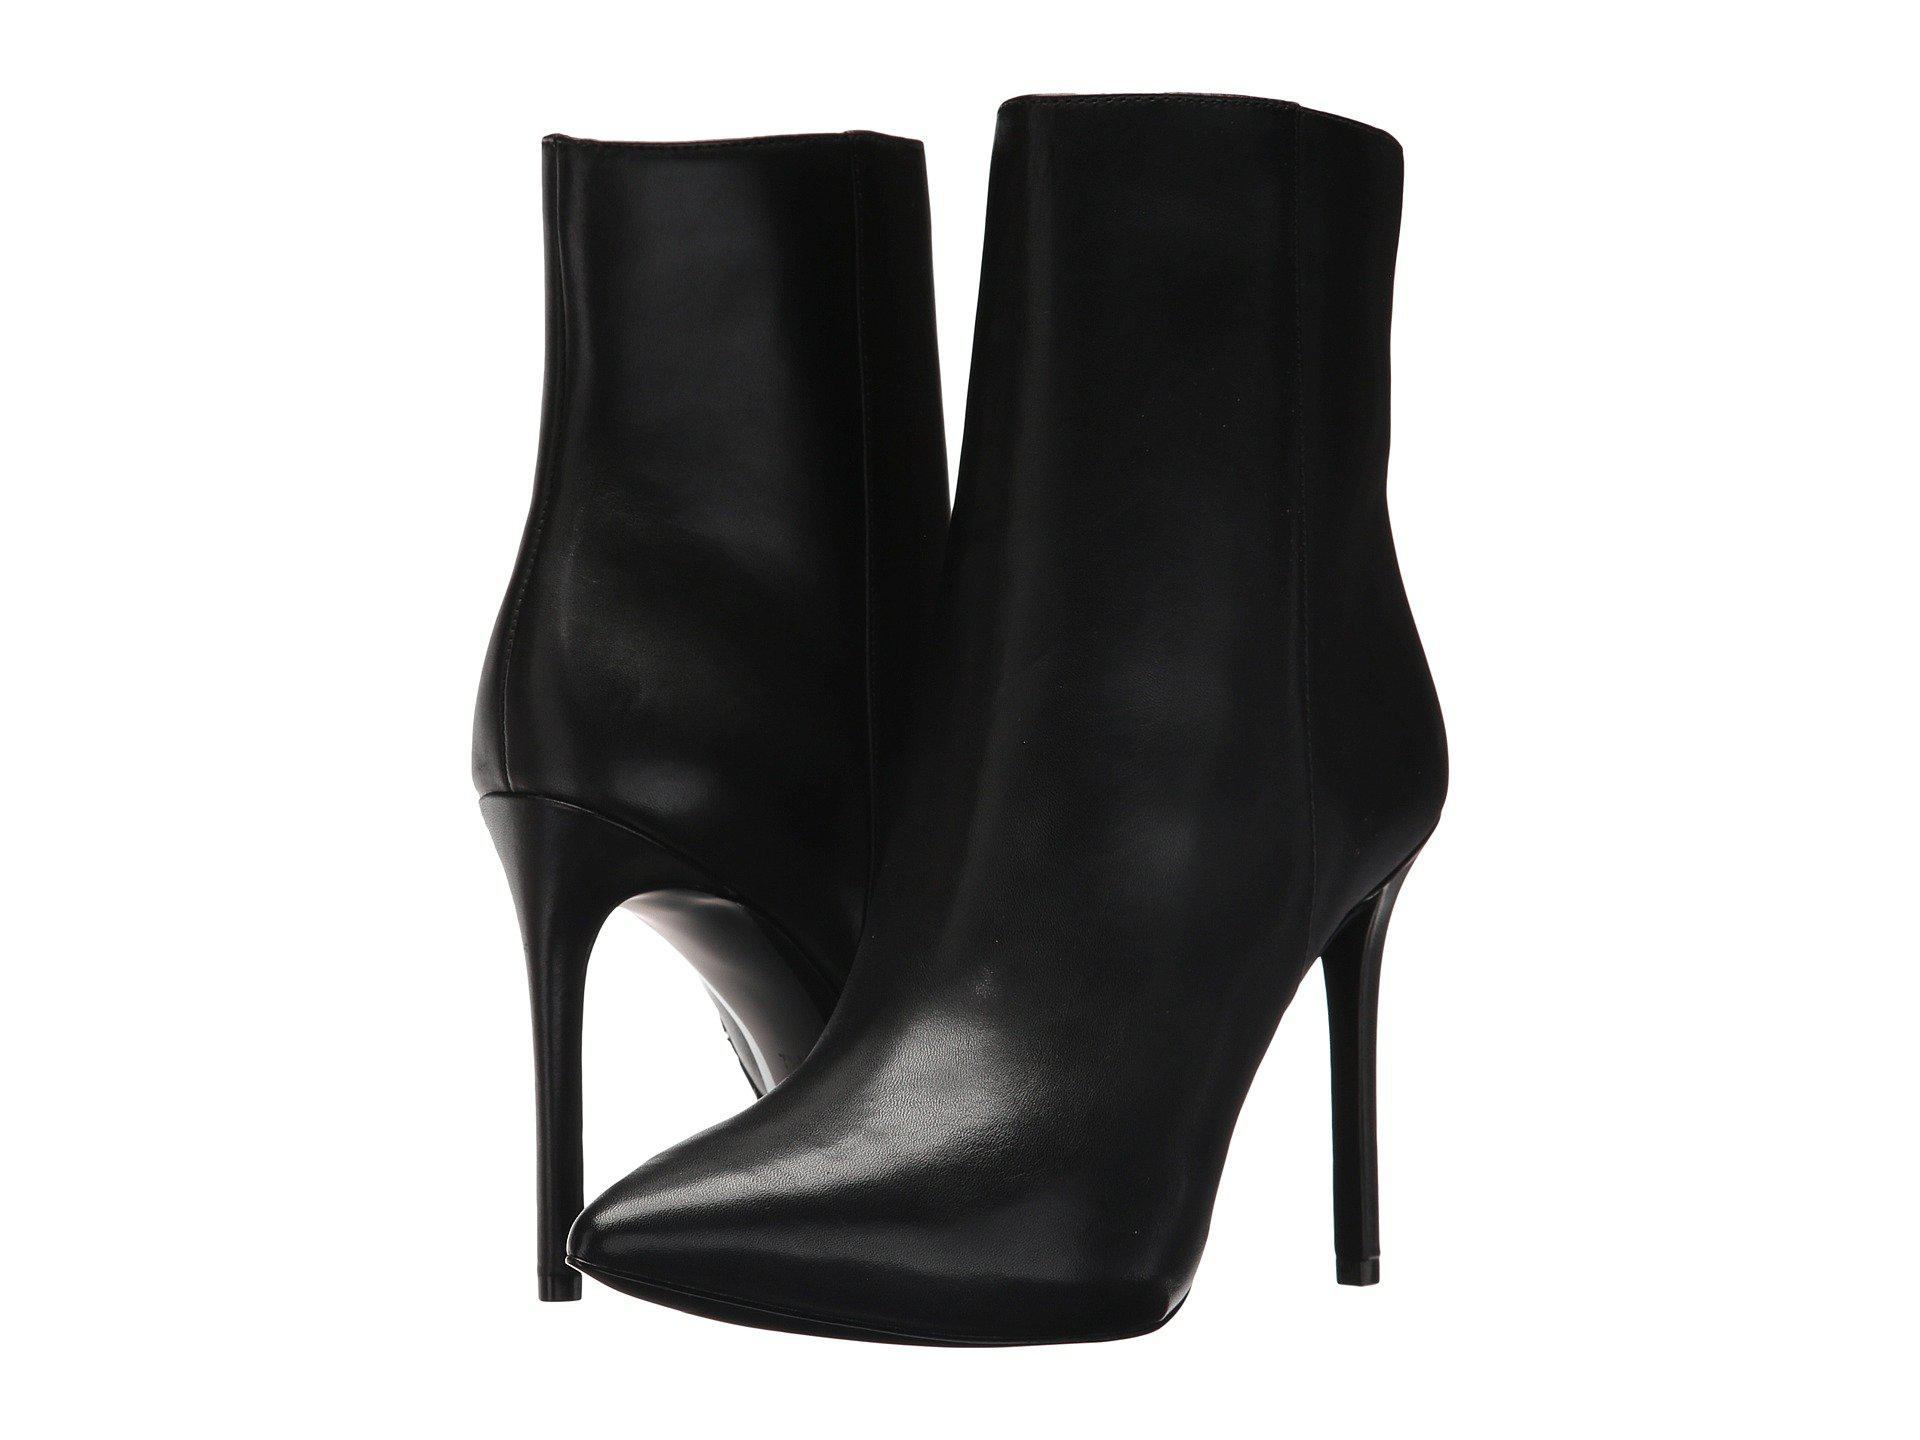 MICHAEL 14vxUi7vF0 BLAZE OPEN TOE BOOTIE - High heeled ankle boots - black qCyhx2